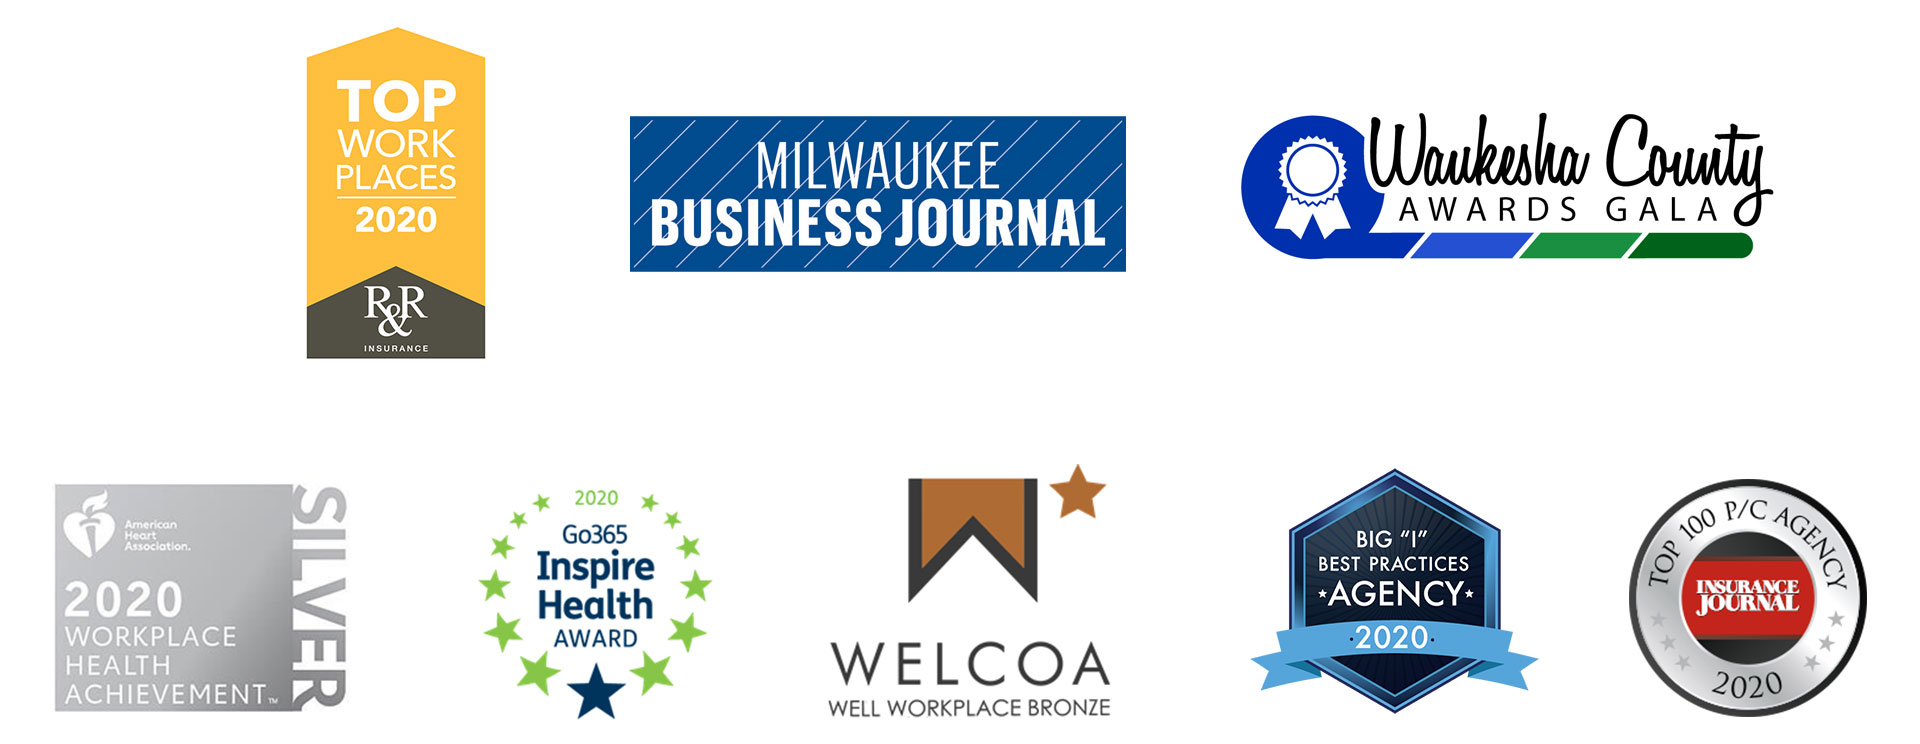 Interior-Page-Assoc-Logo-Layout---Agency-Awards